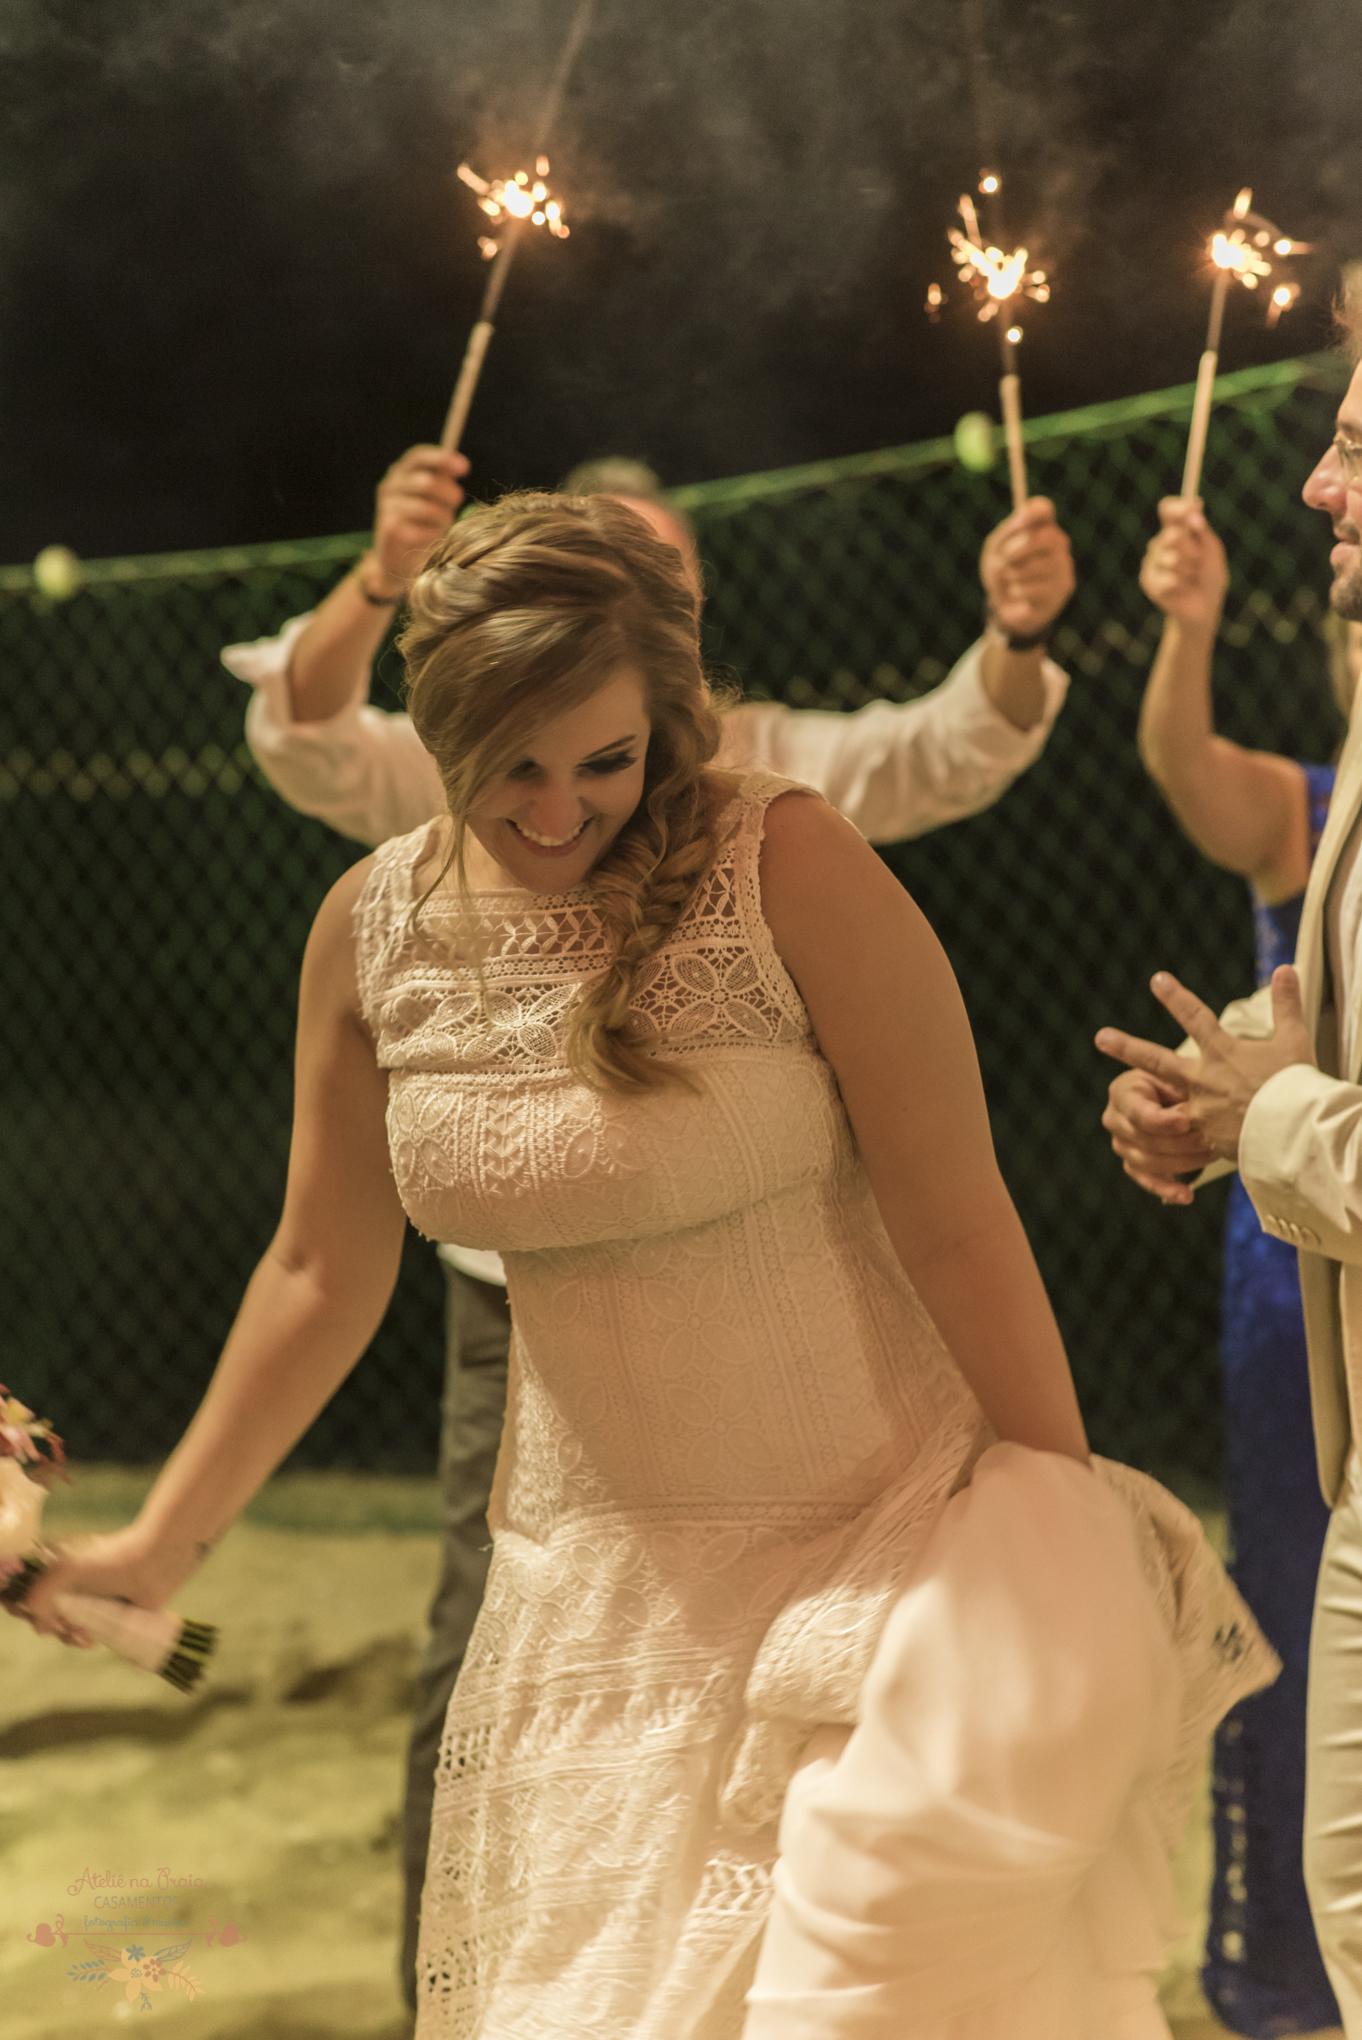 08-Festa-Atelie-na-Praia-Casamento-na-Praia-Erica-Daniel-2-7